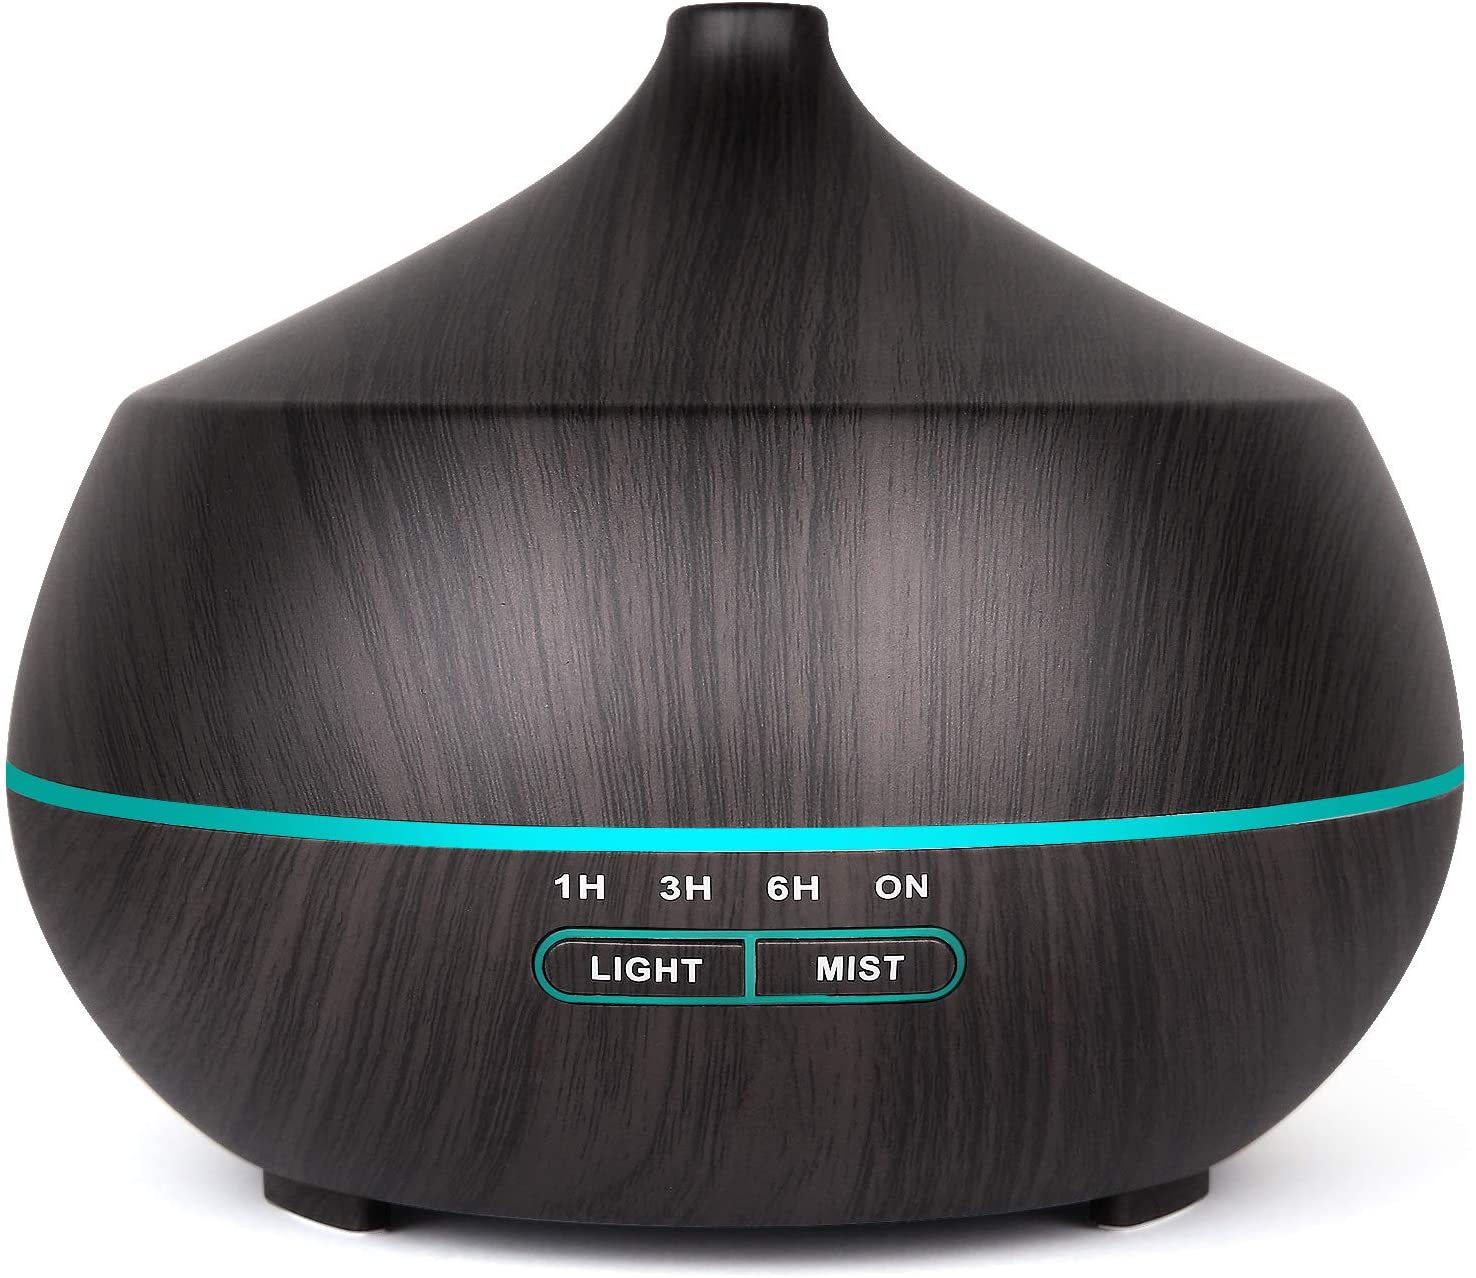 Tenswall Humidificador Ultrasónico,400ml Difusor de Aromaterapia,7-Color LED,4 Temporizador,2 Opciones de Niebla Difusor Aromaterapia para Bebé Yoga Oficina